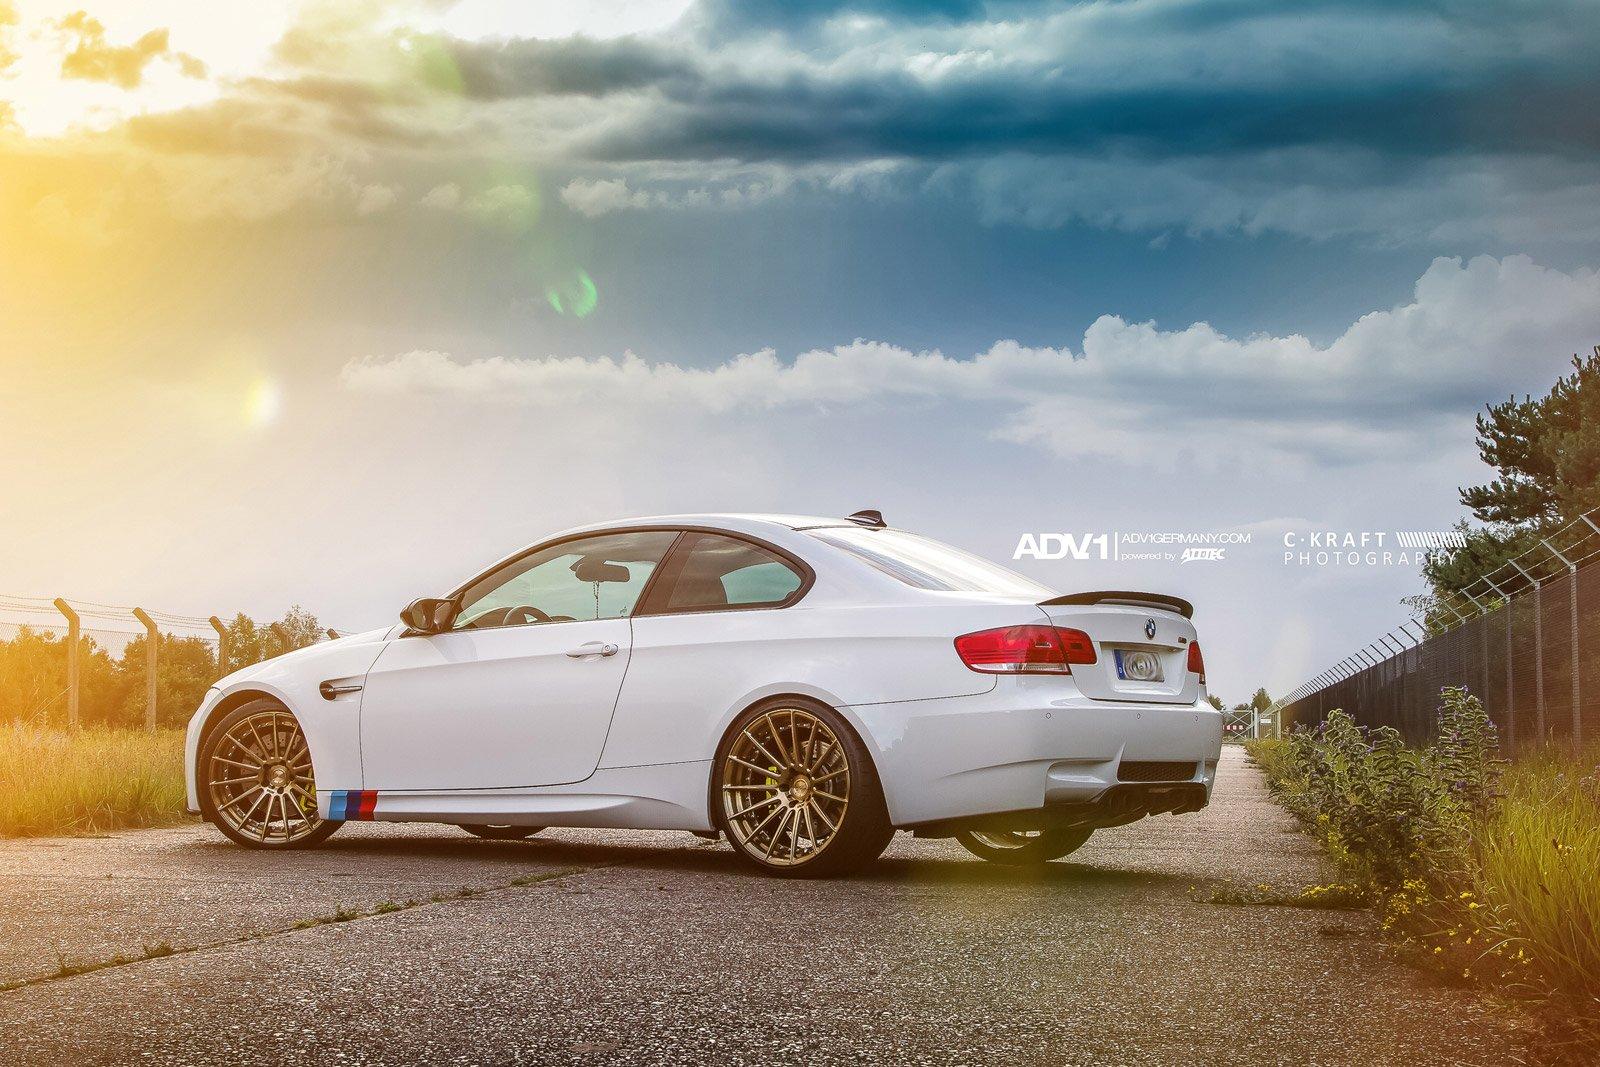 2014_BMW_M3_e92_AMG_adv1_wheels_tuning_1600x1067 (2).jpg